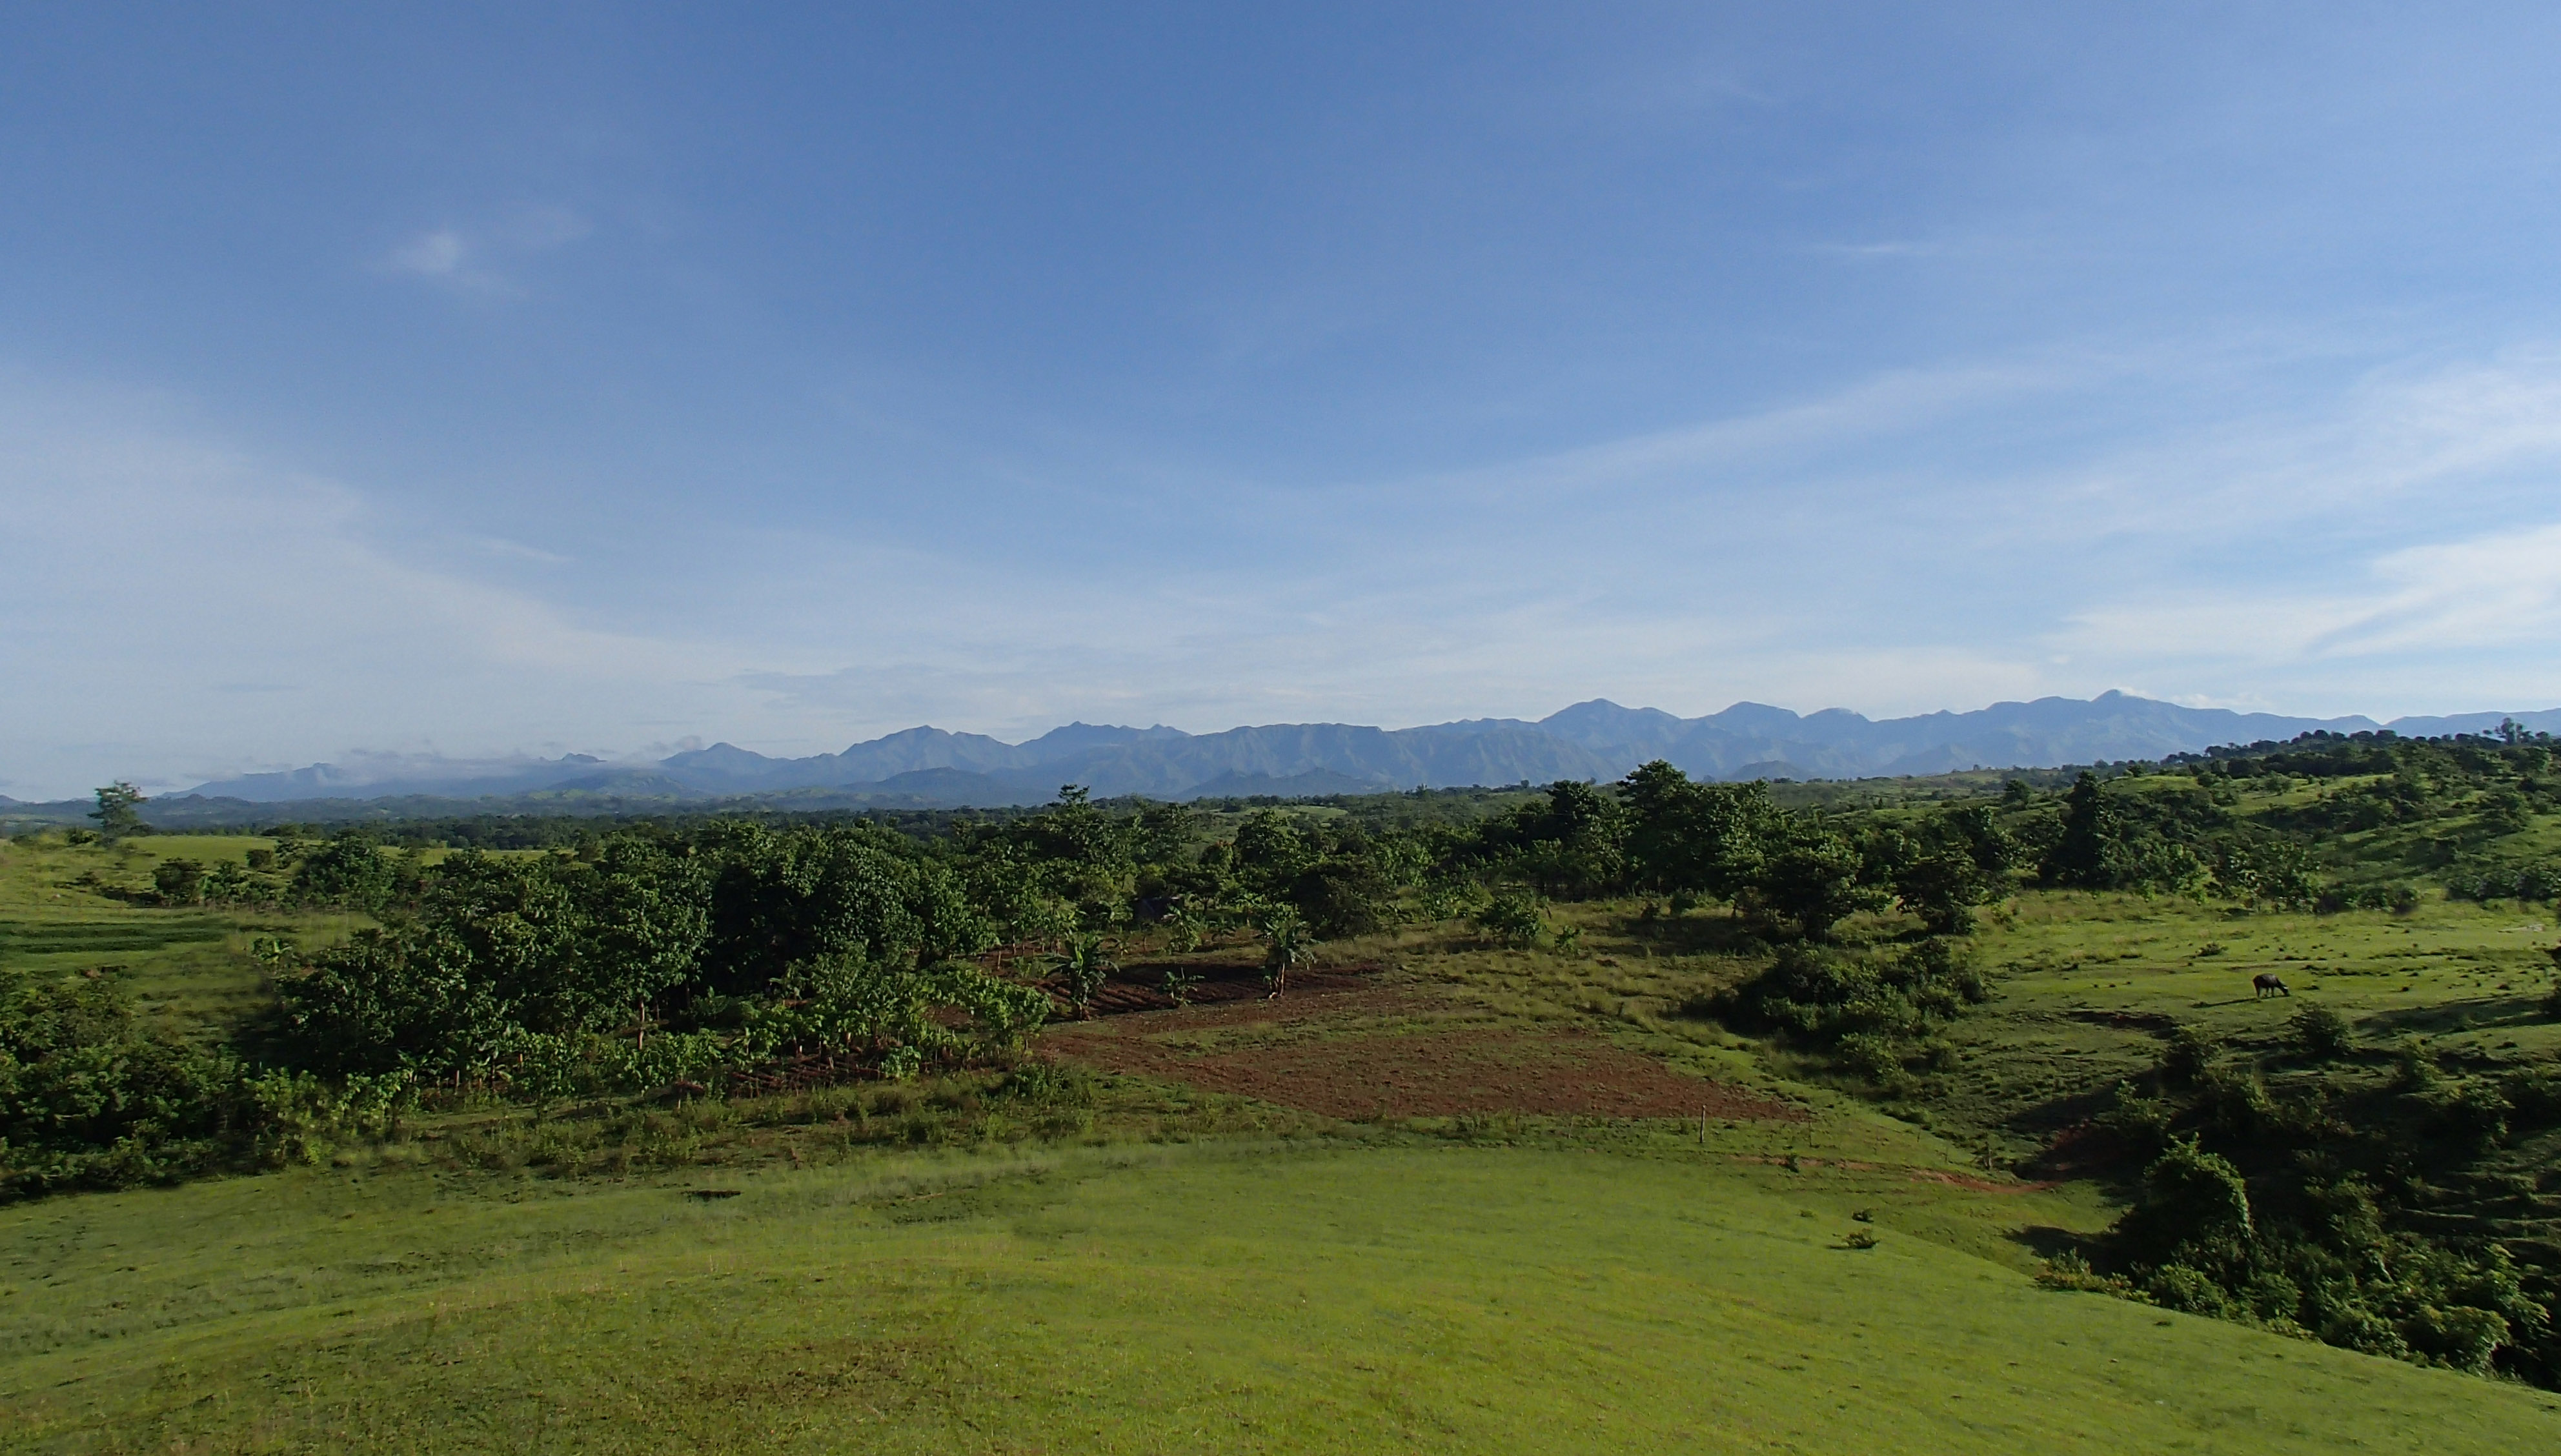 Occidental Mindoro - Wikipedia